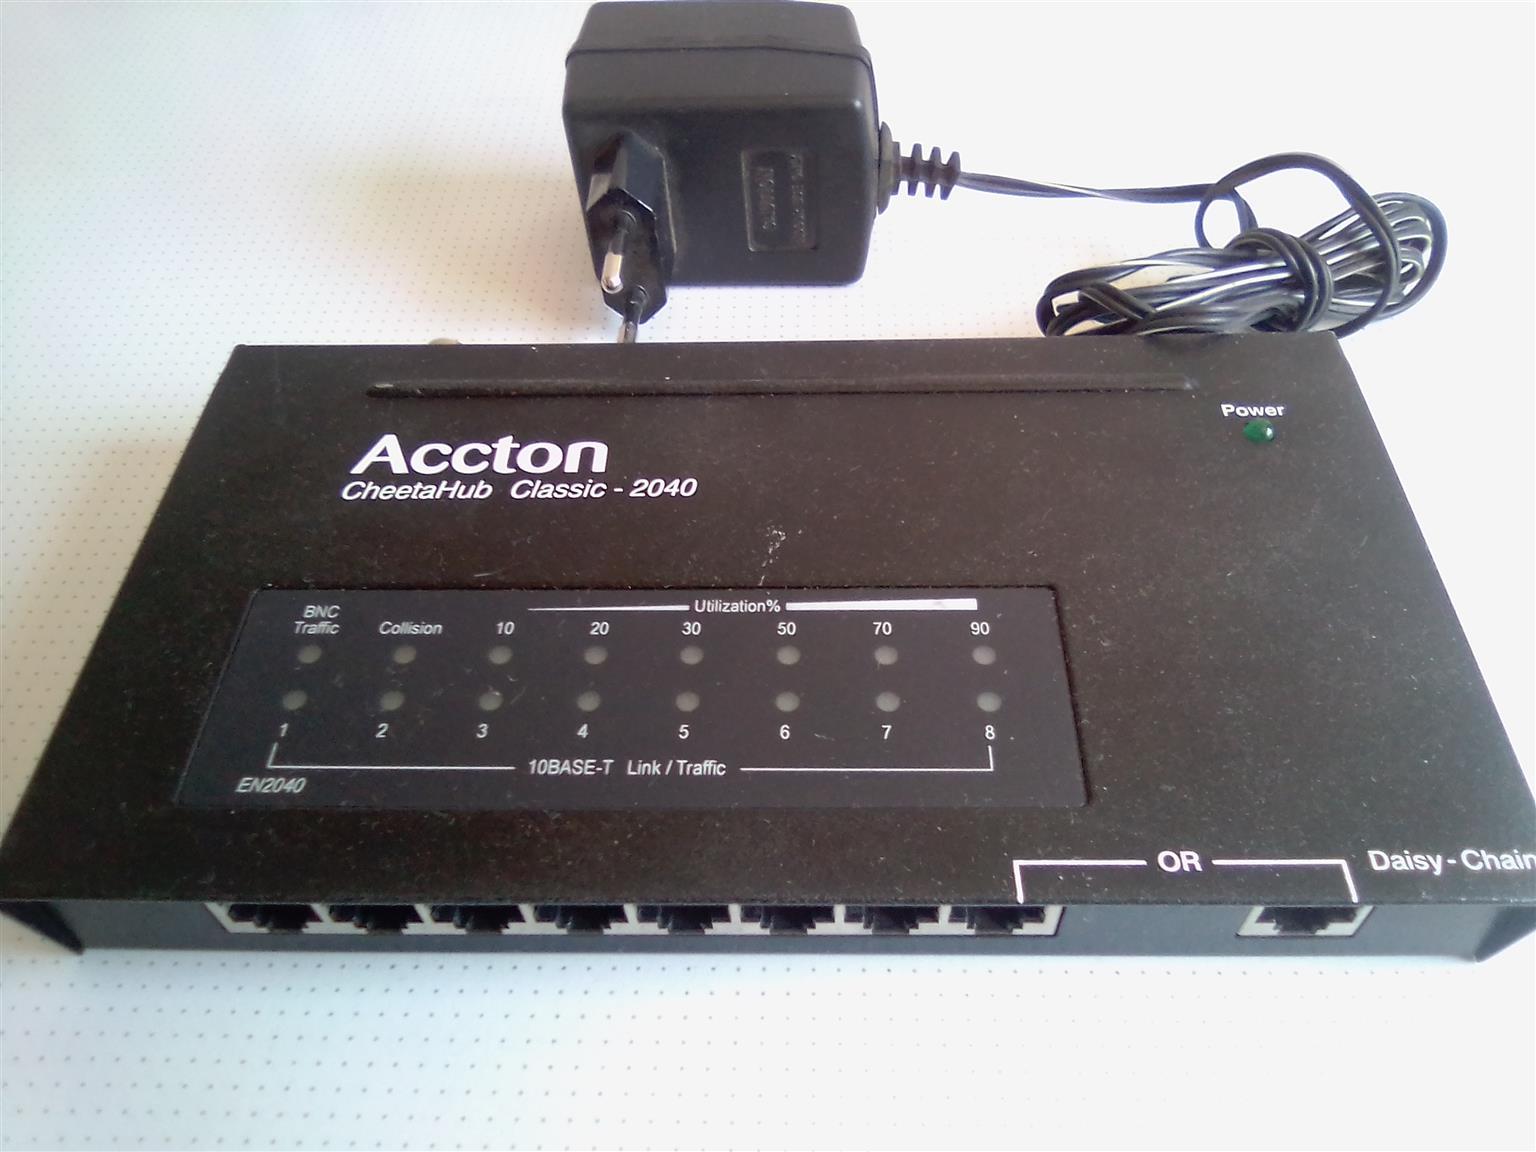 Acton CheetaHub 8+1 slots plus BNC connectors. Power supply included.